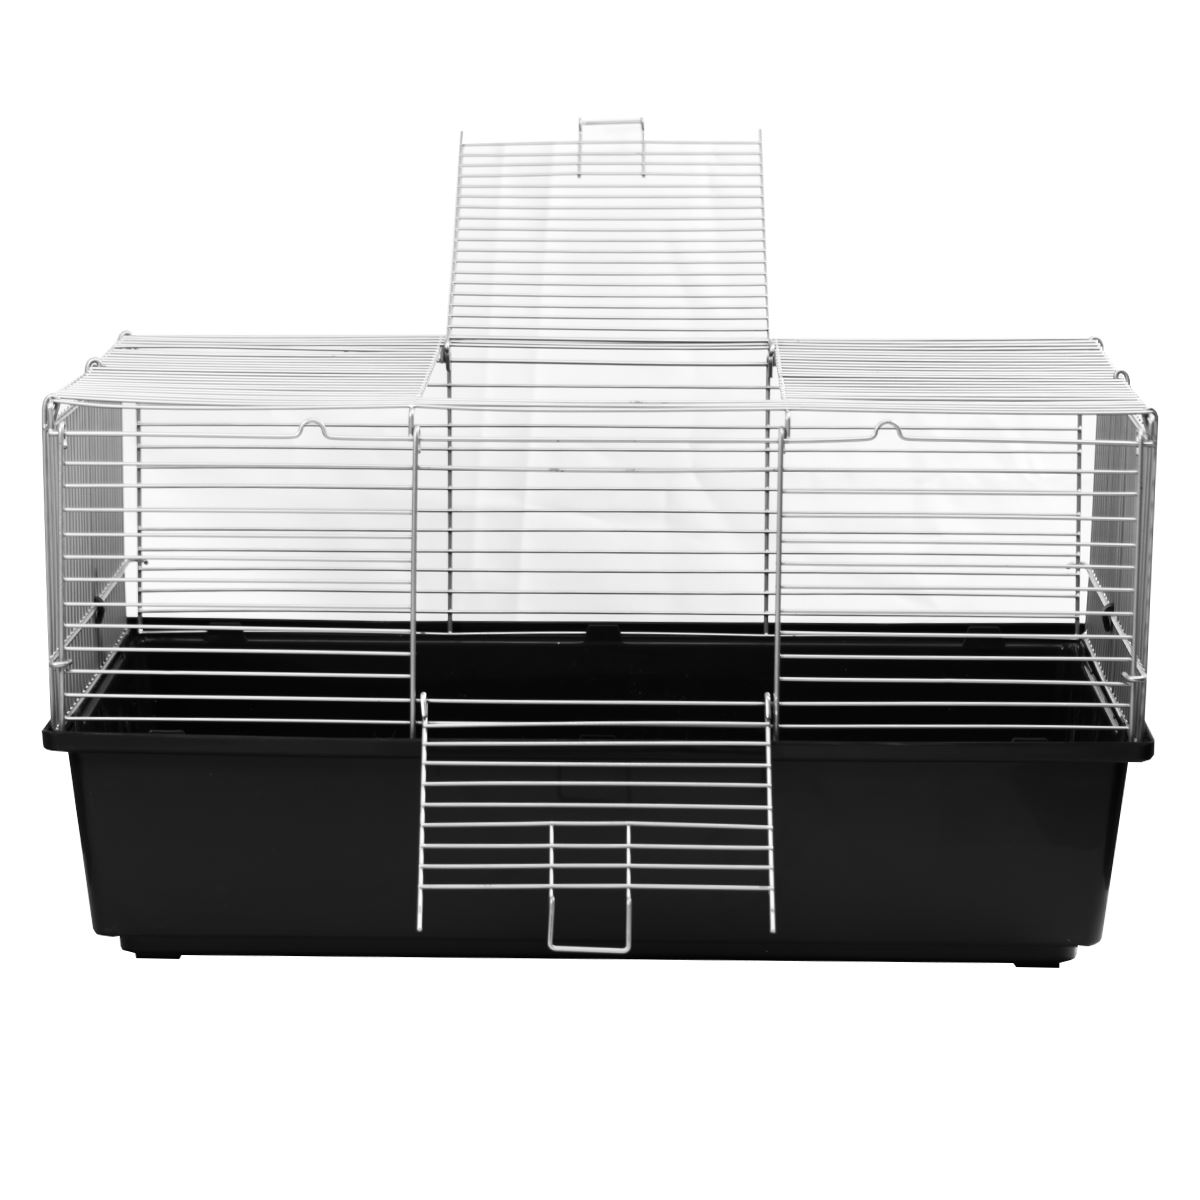 Kct Small Indoor Pet Cage 60cm Single Level Dark Grey Home House Animal Hamster Ebay